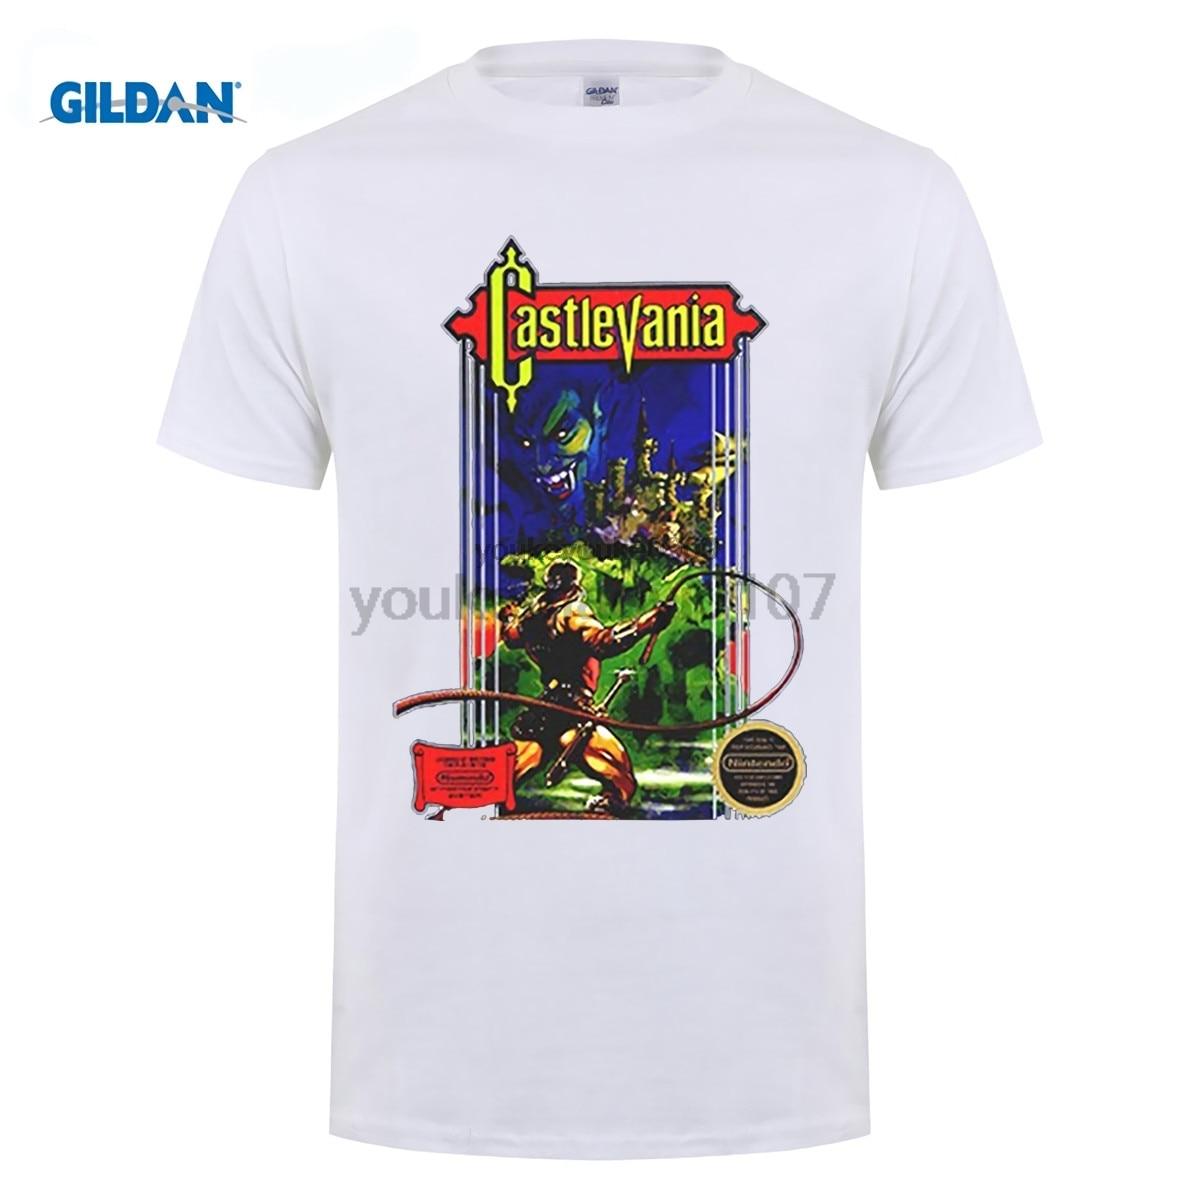 GILDAN Castlevania NES Retro Video Game T Shirt Short Sleeve Style O-Neck Tee Shirt T Shirt Men Loose Size T-shirt